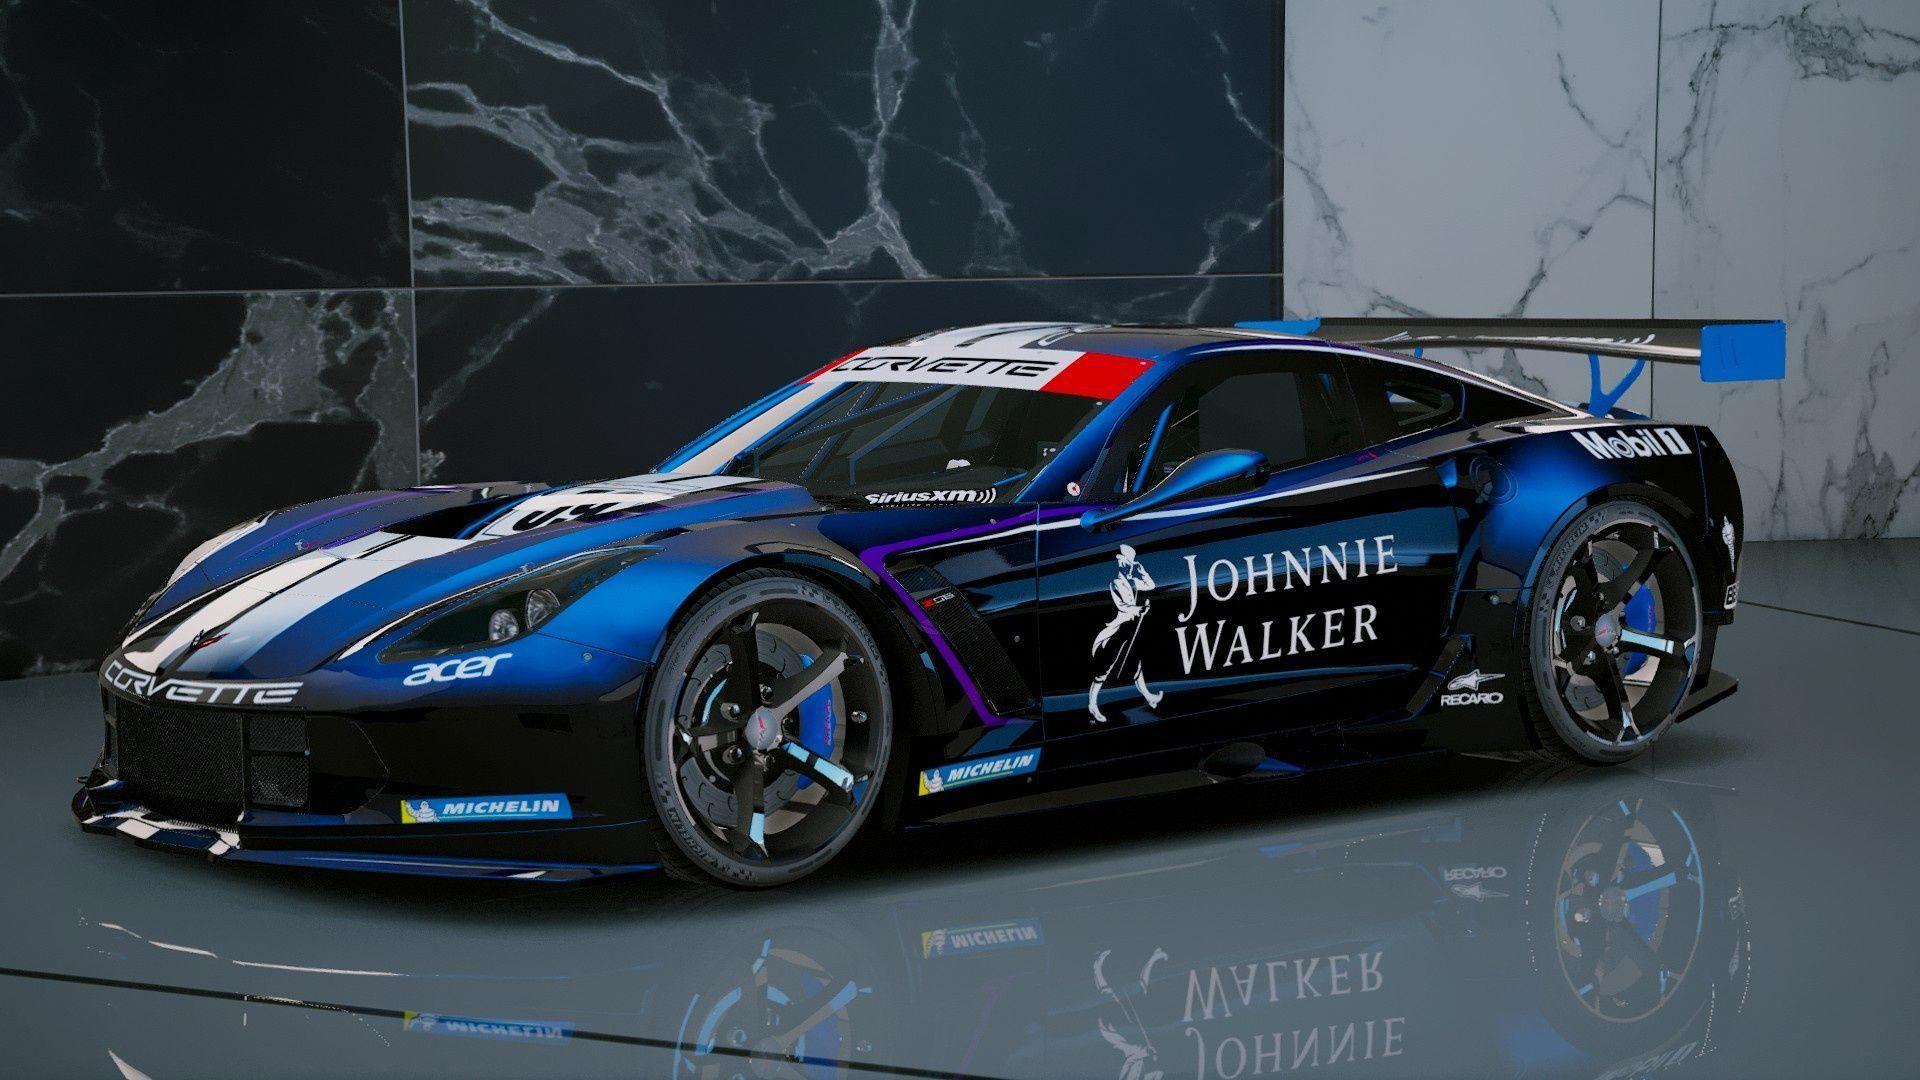 Omg I Truly Adore This Color Selection For This Corvette Chevrolet Corvette Corvette Race Car Corvette